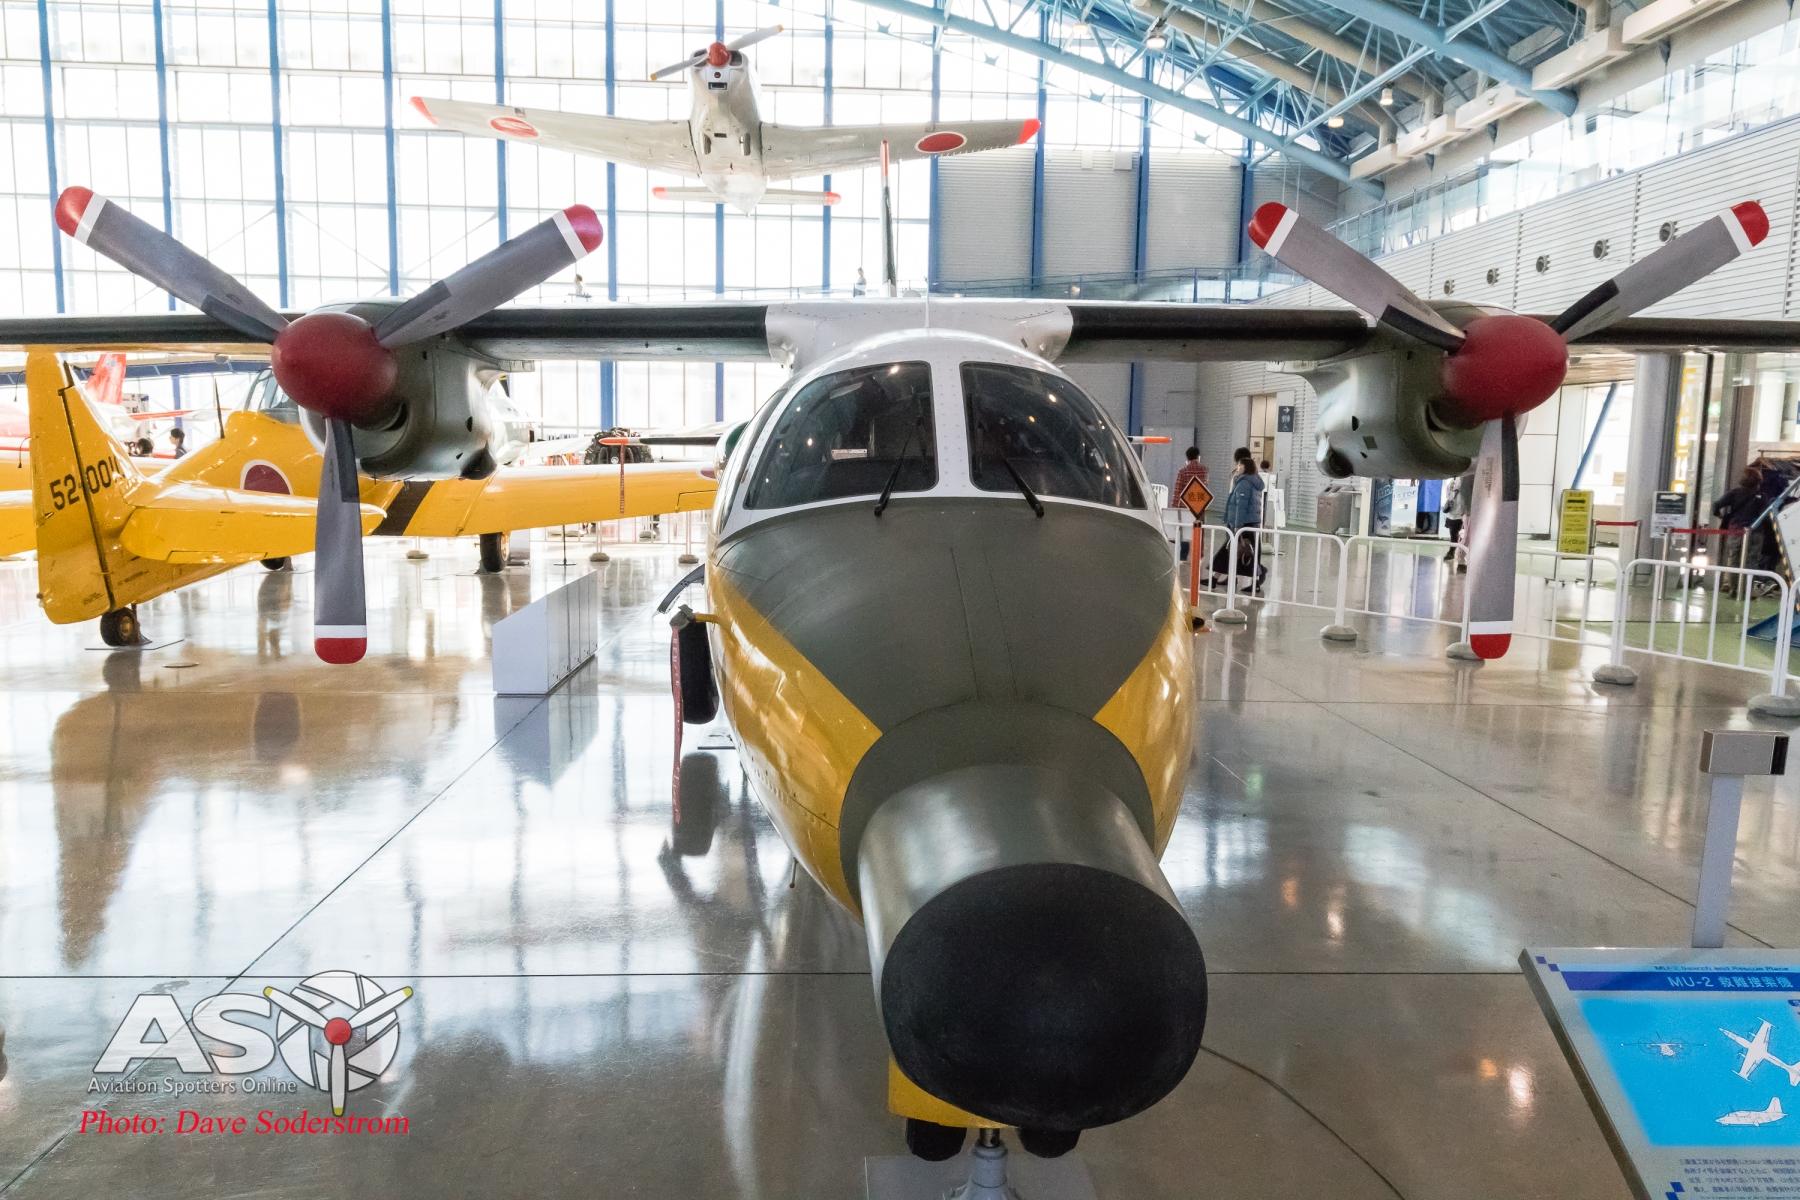 JASDF-Museum-27-1-of-1